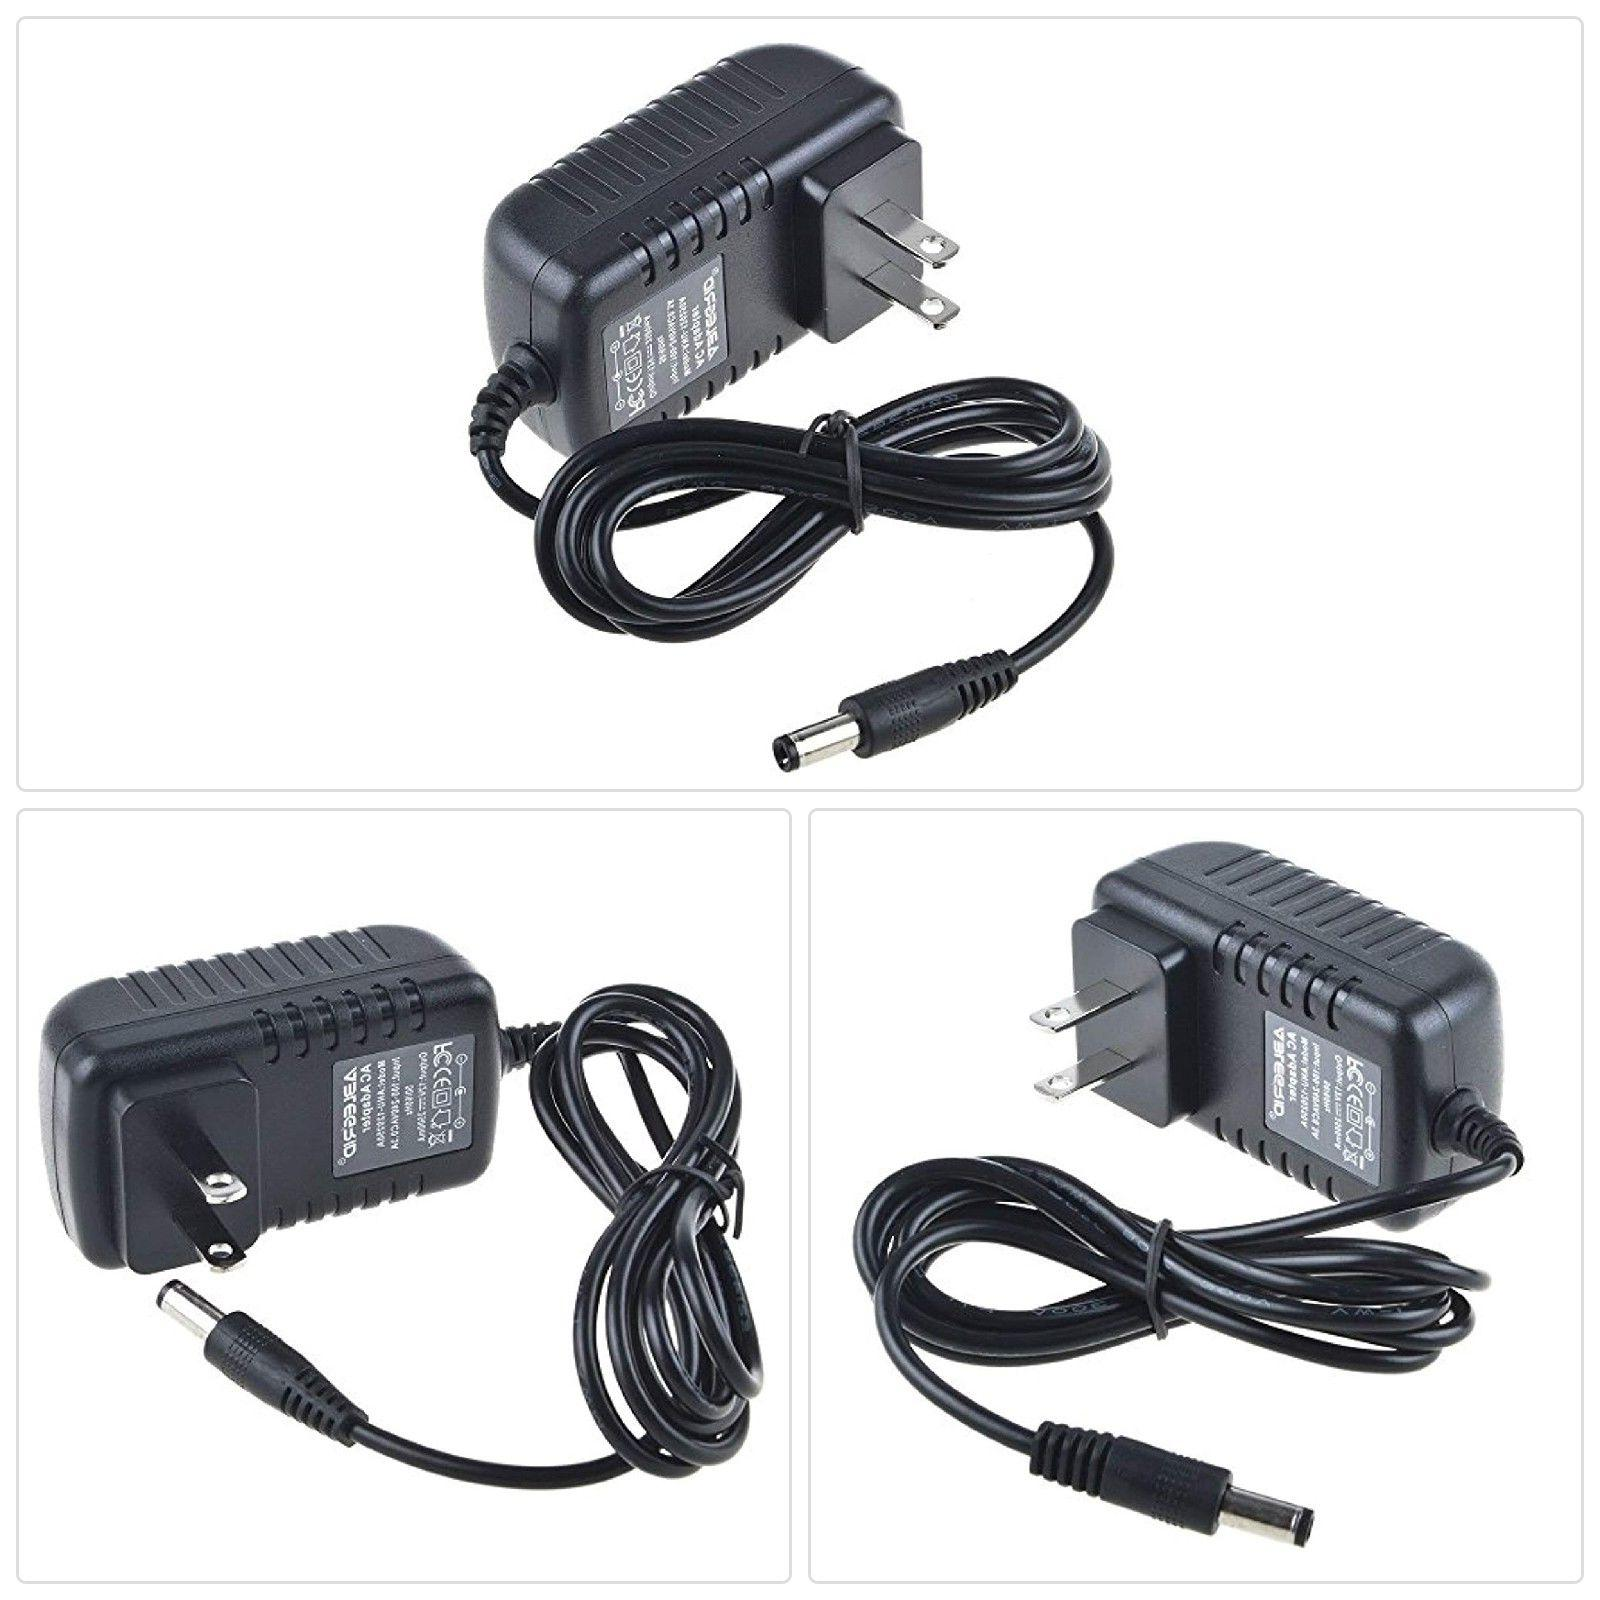 12 volt power supply 2 5 amp